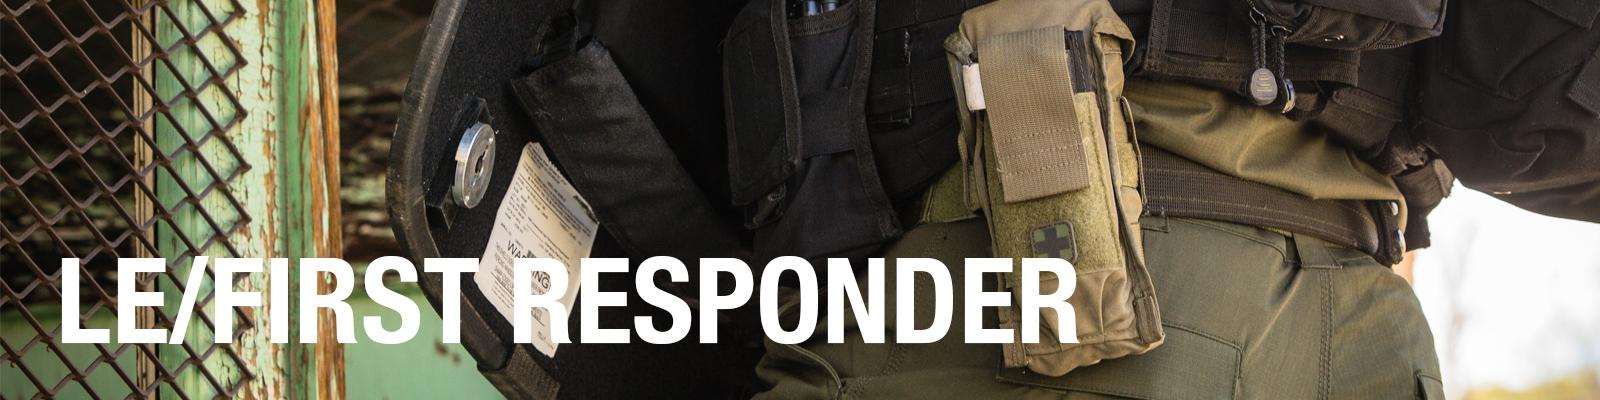 first-responder1.jpg